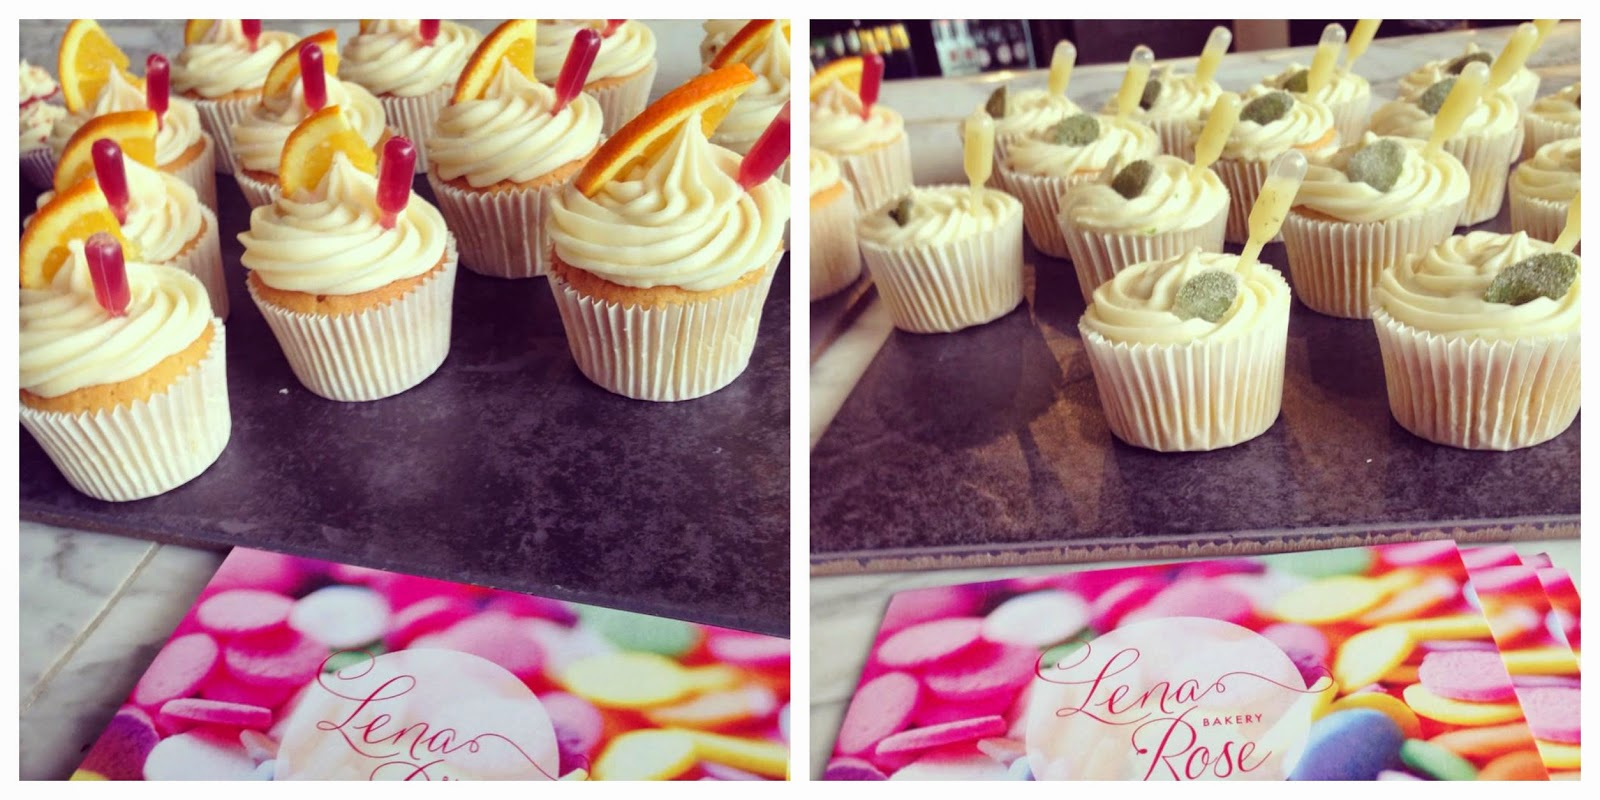 Lena Rose Bakery Cupcakes